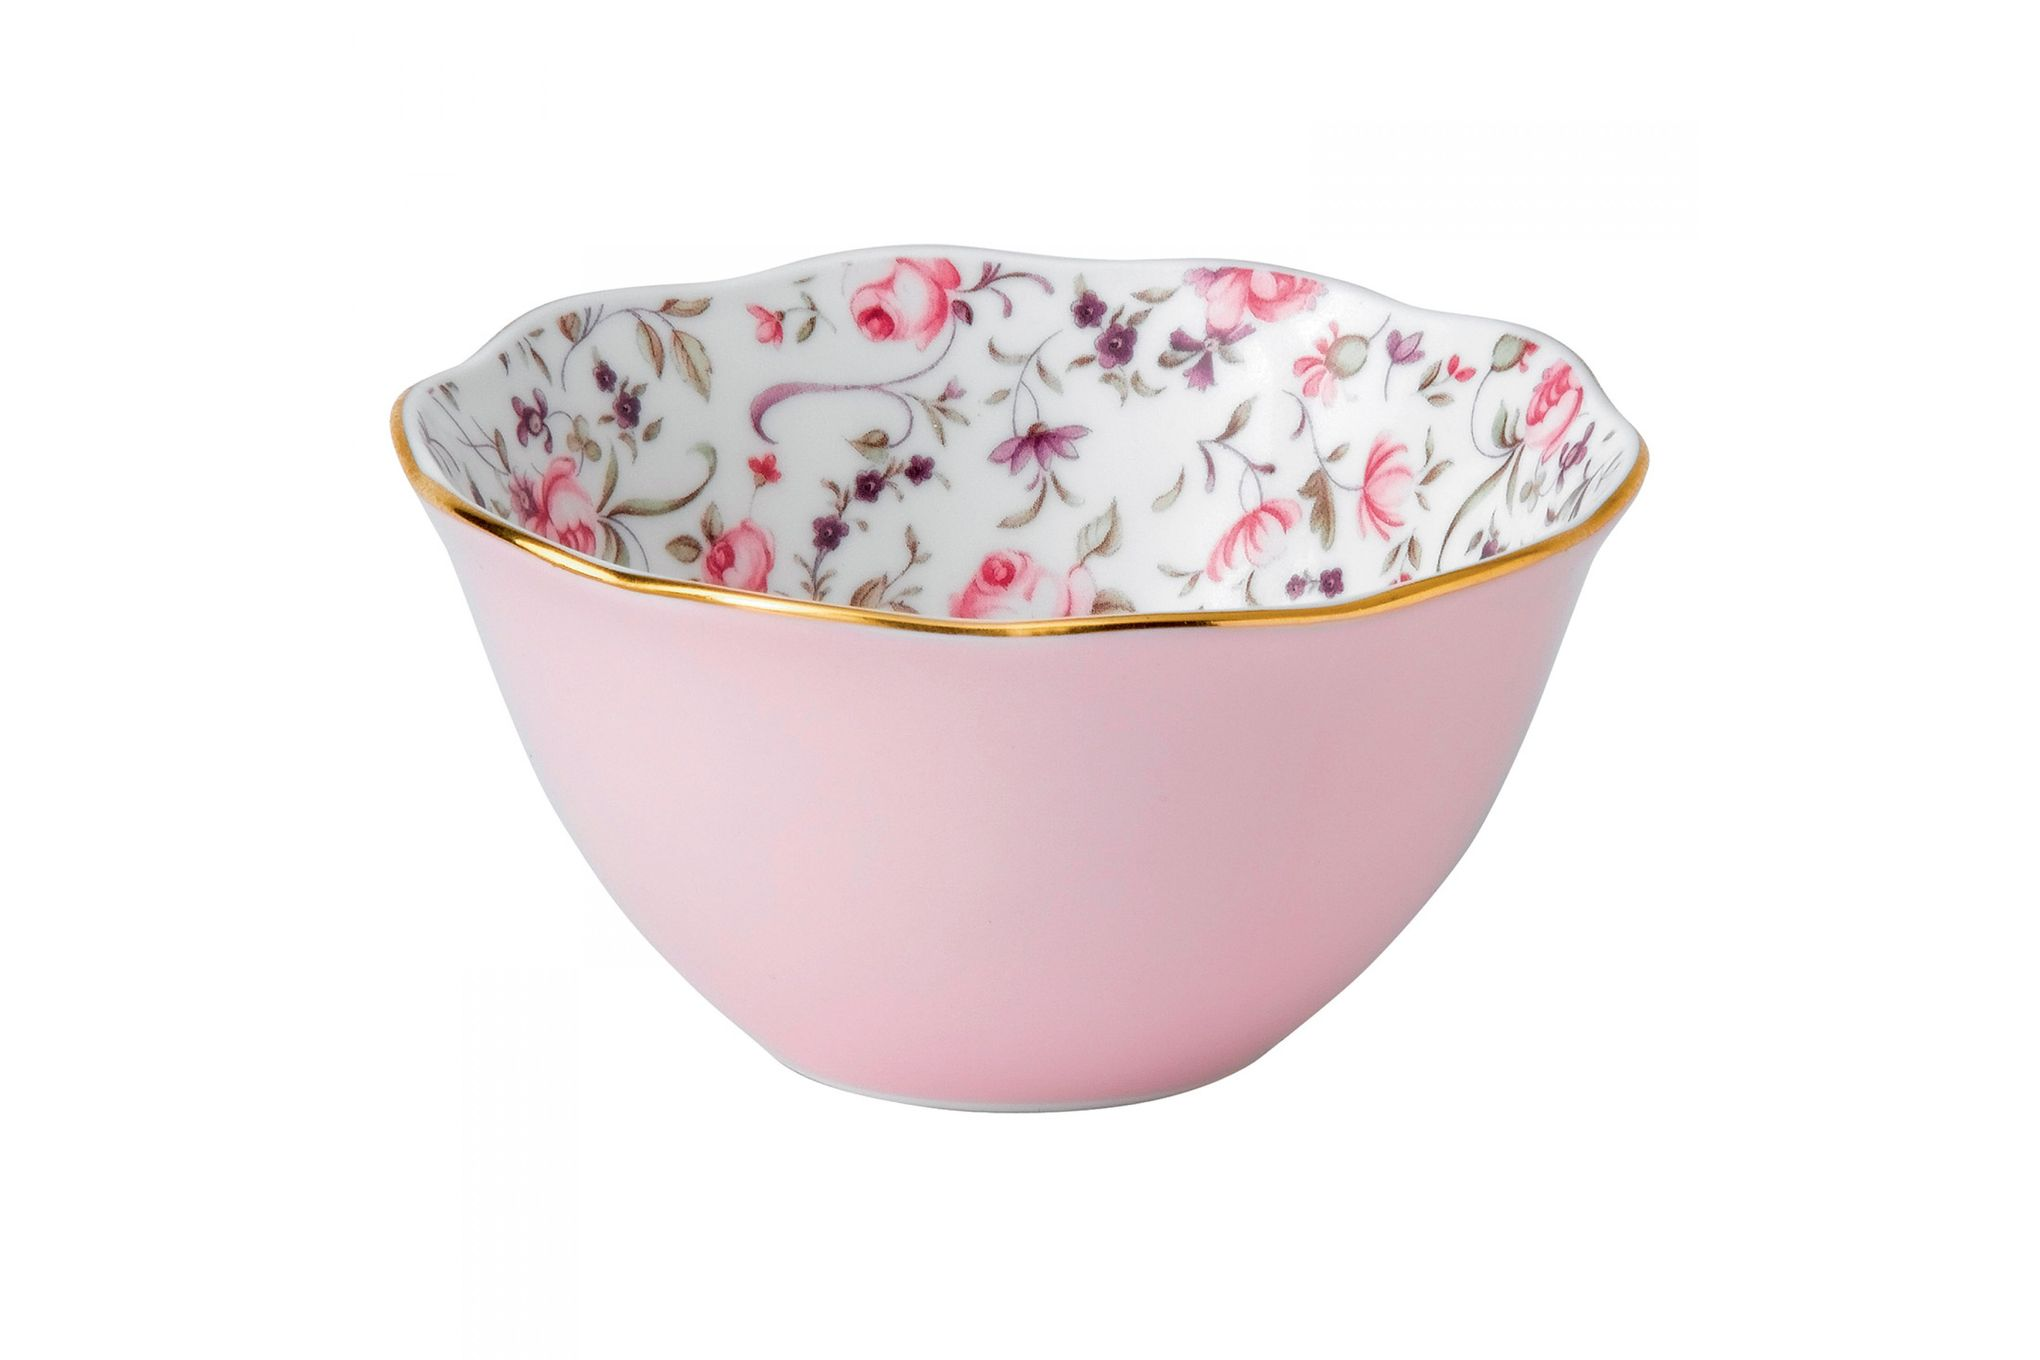 Royal Albert Rose Confetti Bowl Ice Cream Bowl thumb 1